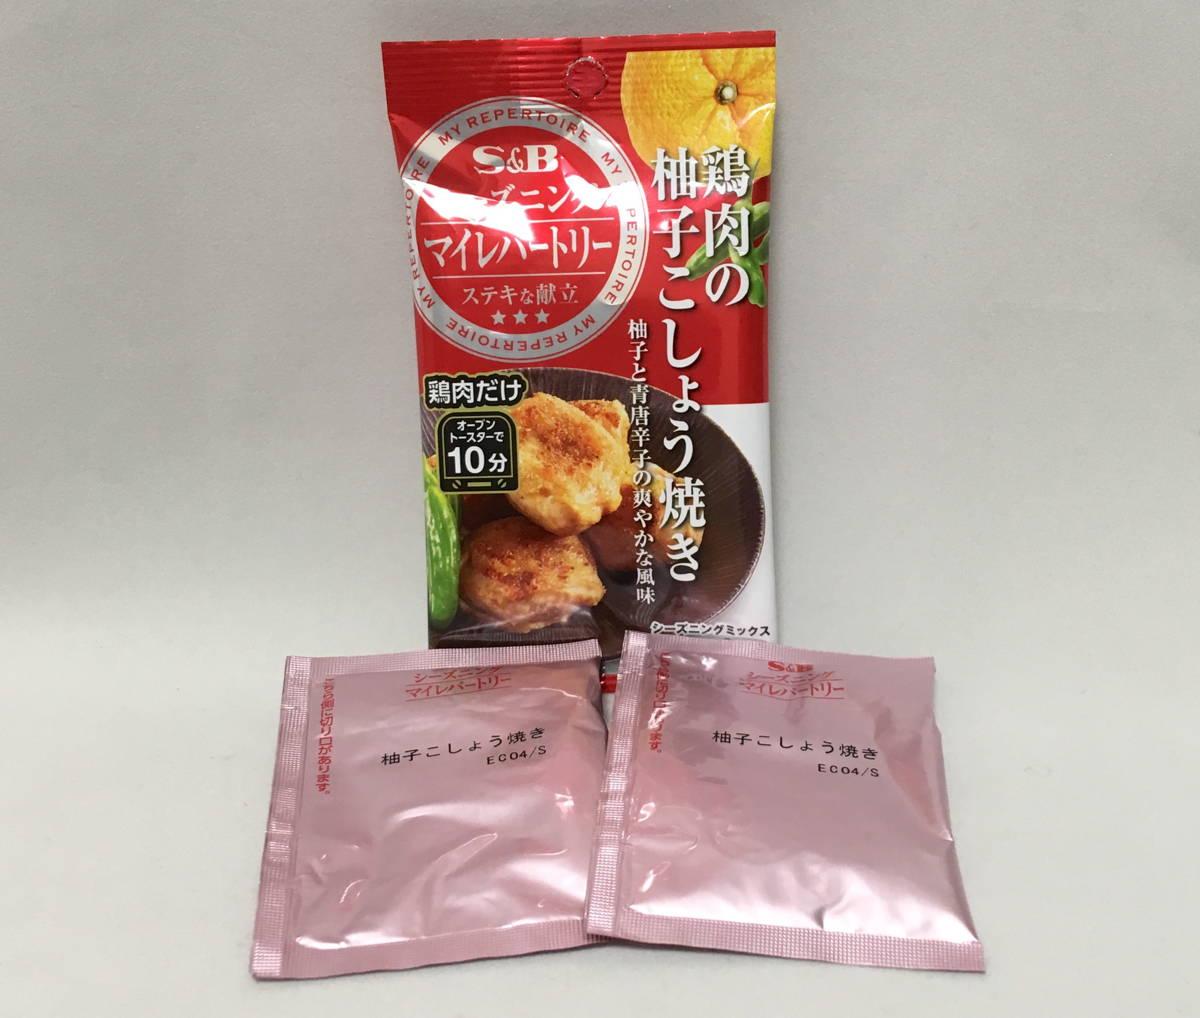 S&B エスビー seasoning yuzu pepper シーズニング マイレパートリー 柚子こしょう焼き